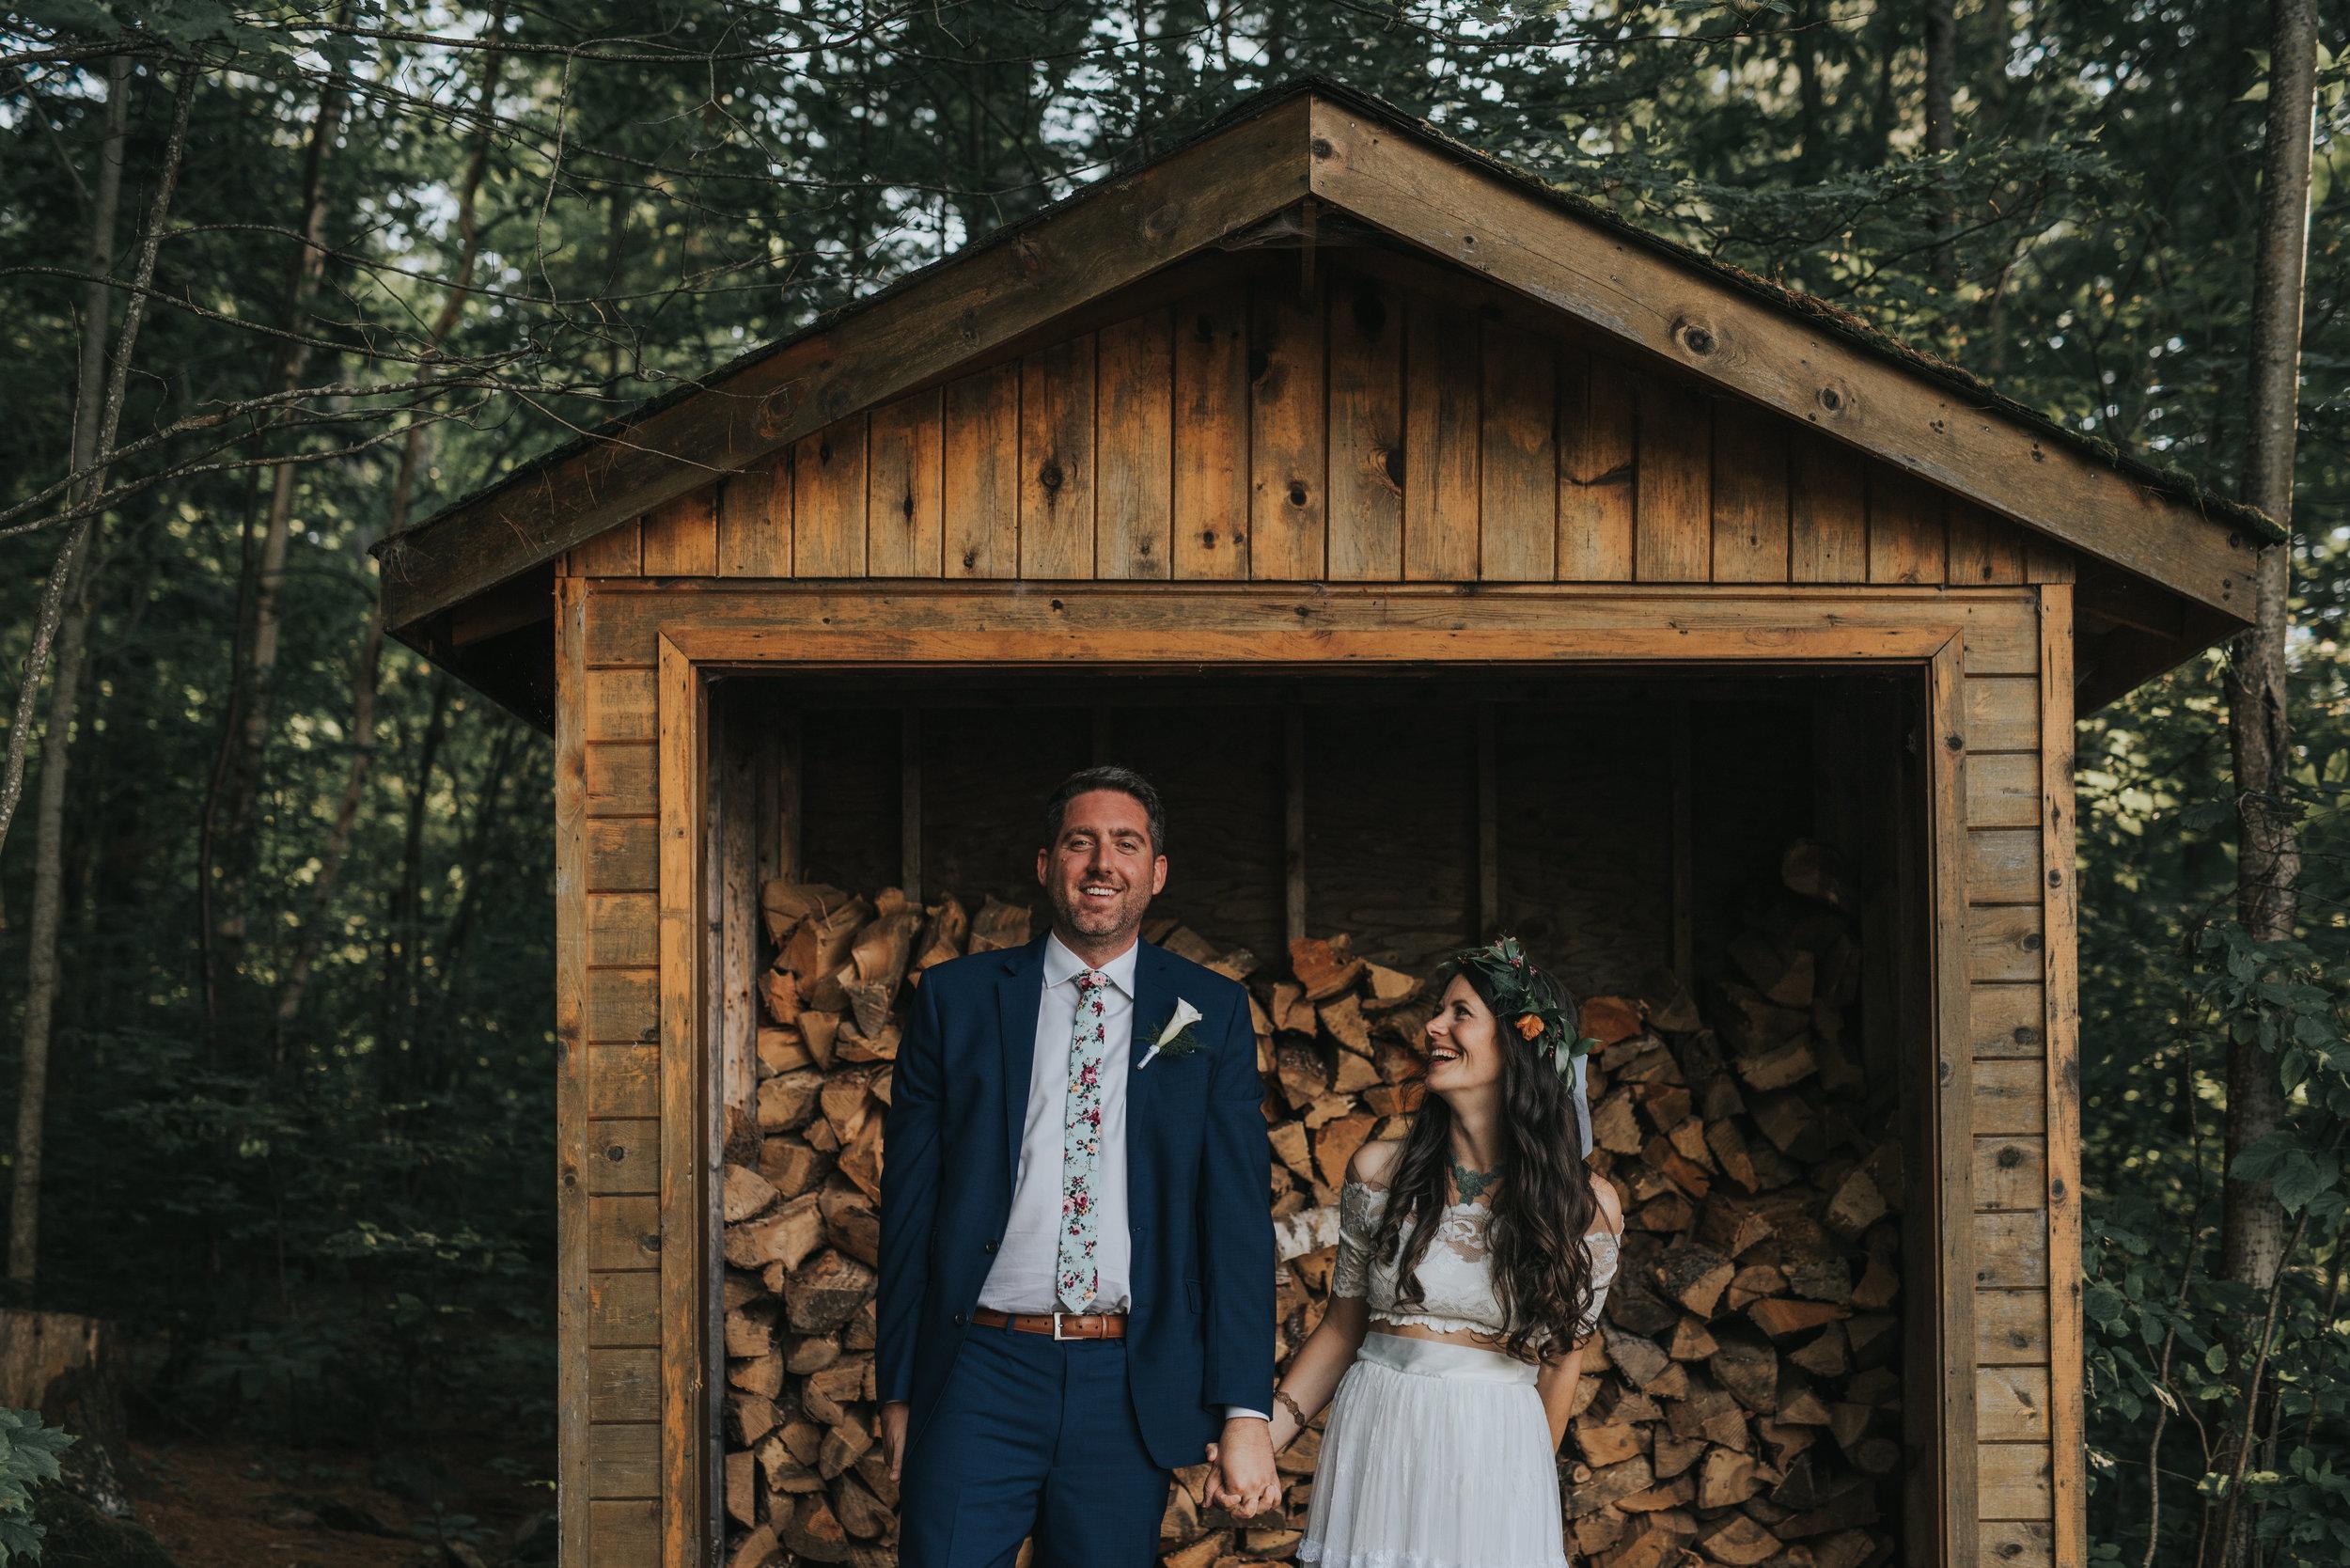 bride-groom-rustic-cabin-wedding-toronto-bohemian-boho-outdoor-summer-wedding-documentary-wedding-photography-by-willow-birch-photo.jpg